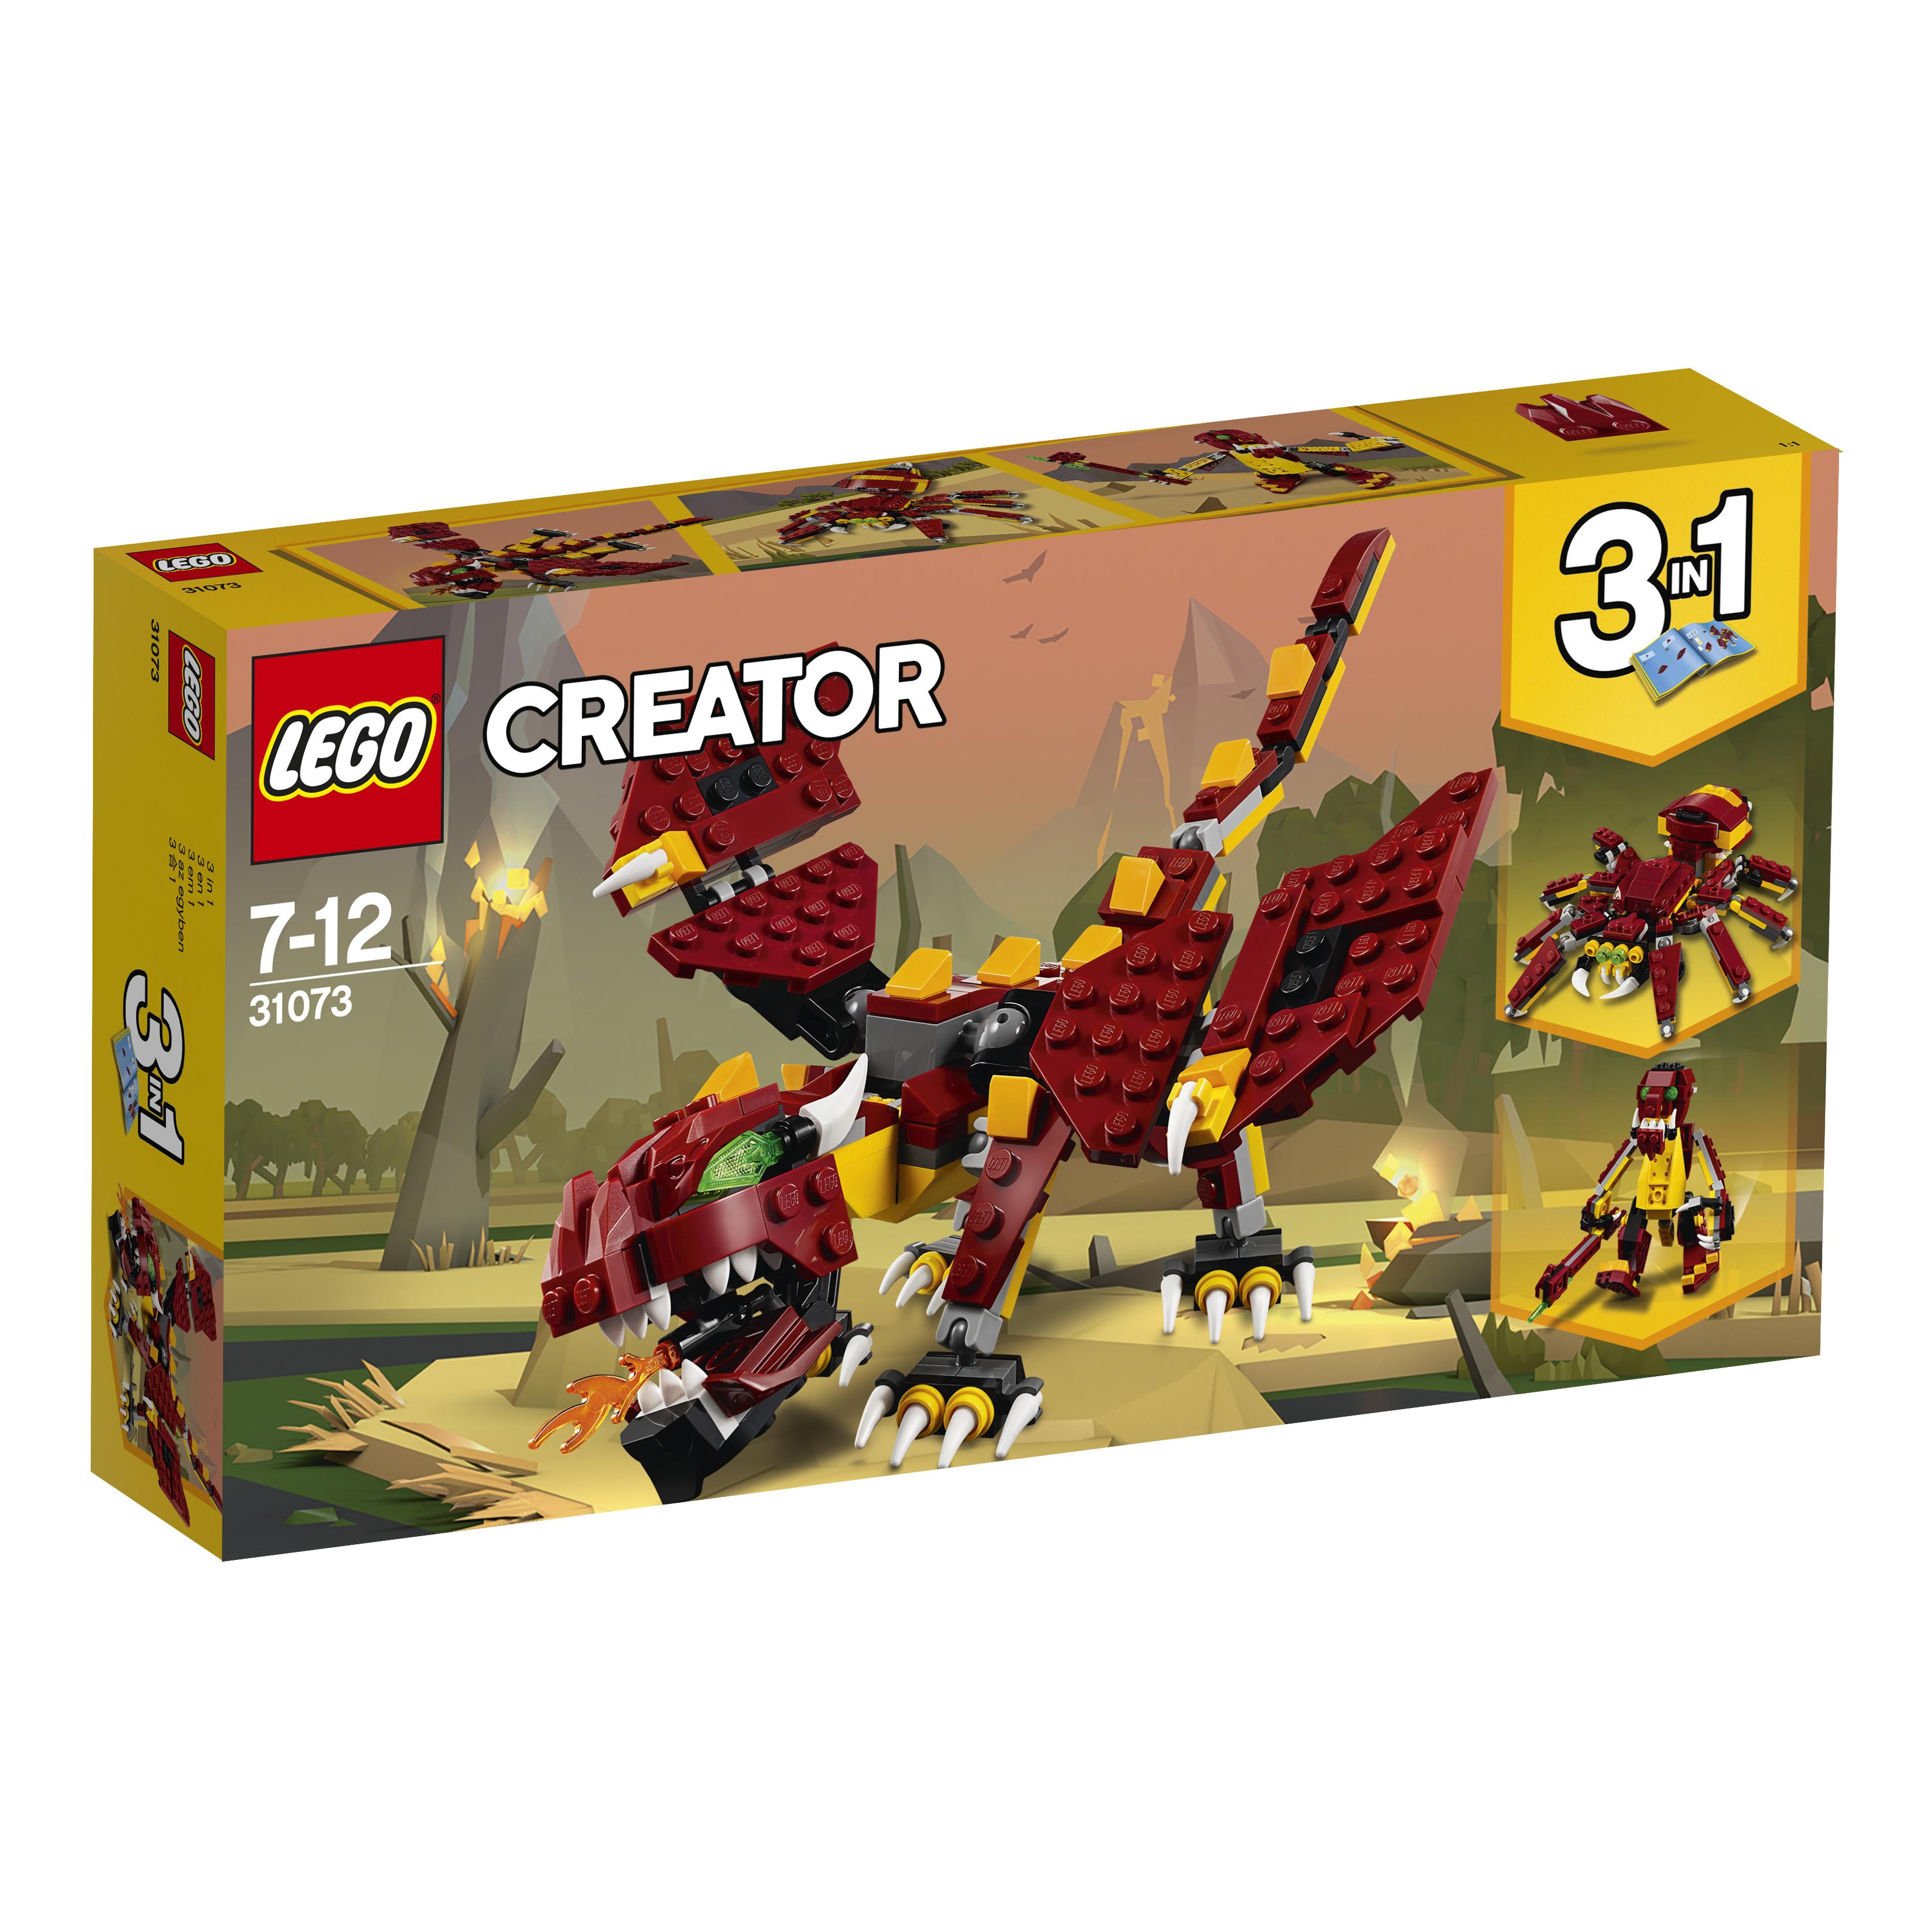 все цены на Конструктор LEGO Creator 31073 Мифические существа онлайн